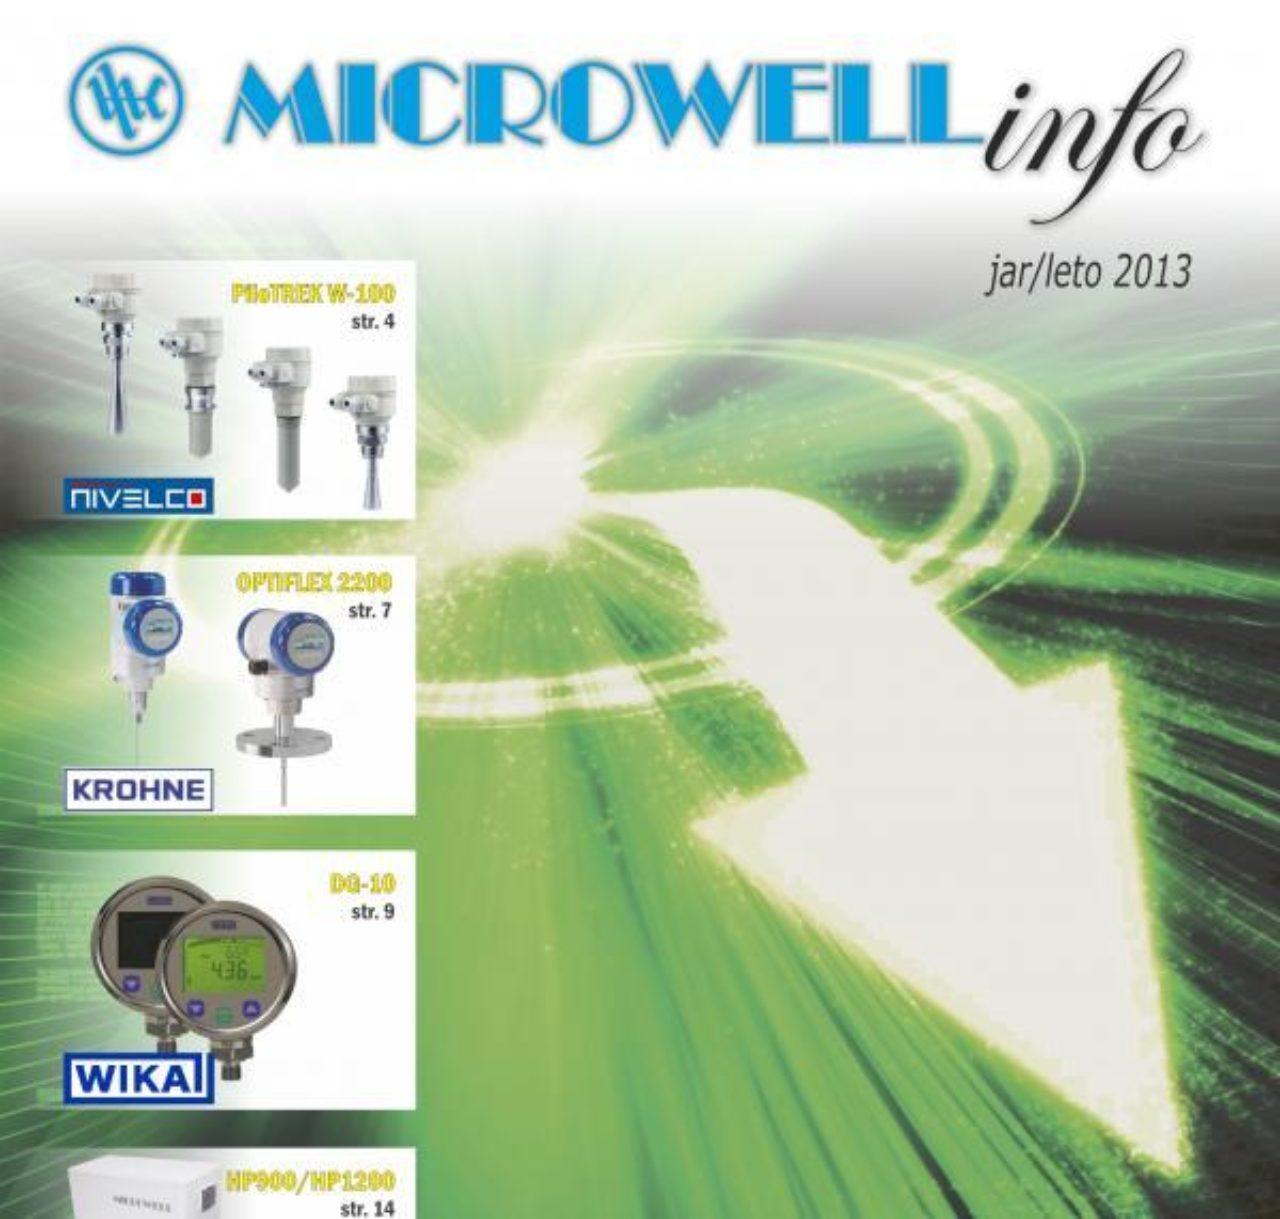 Microwell INFO jar-leto 2013 | Blog - Microwell